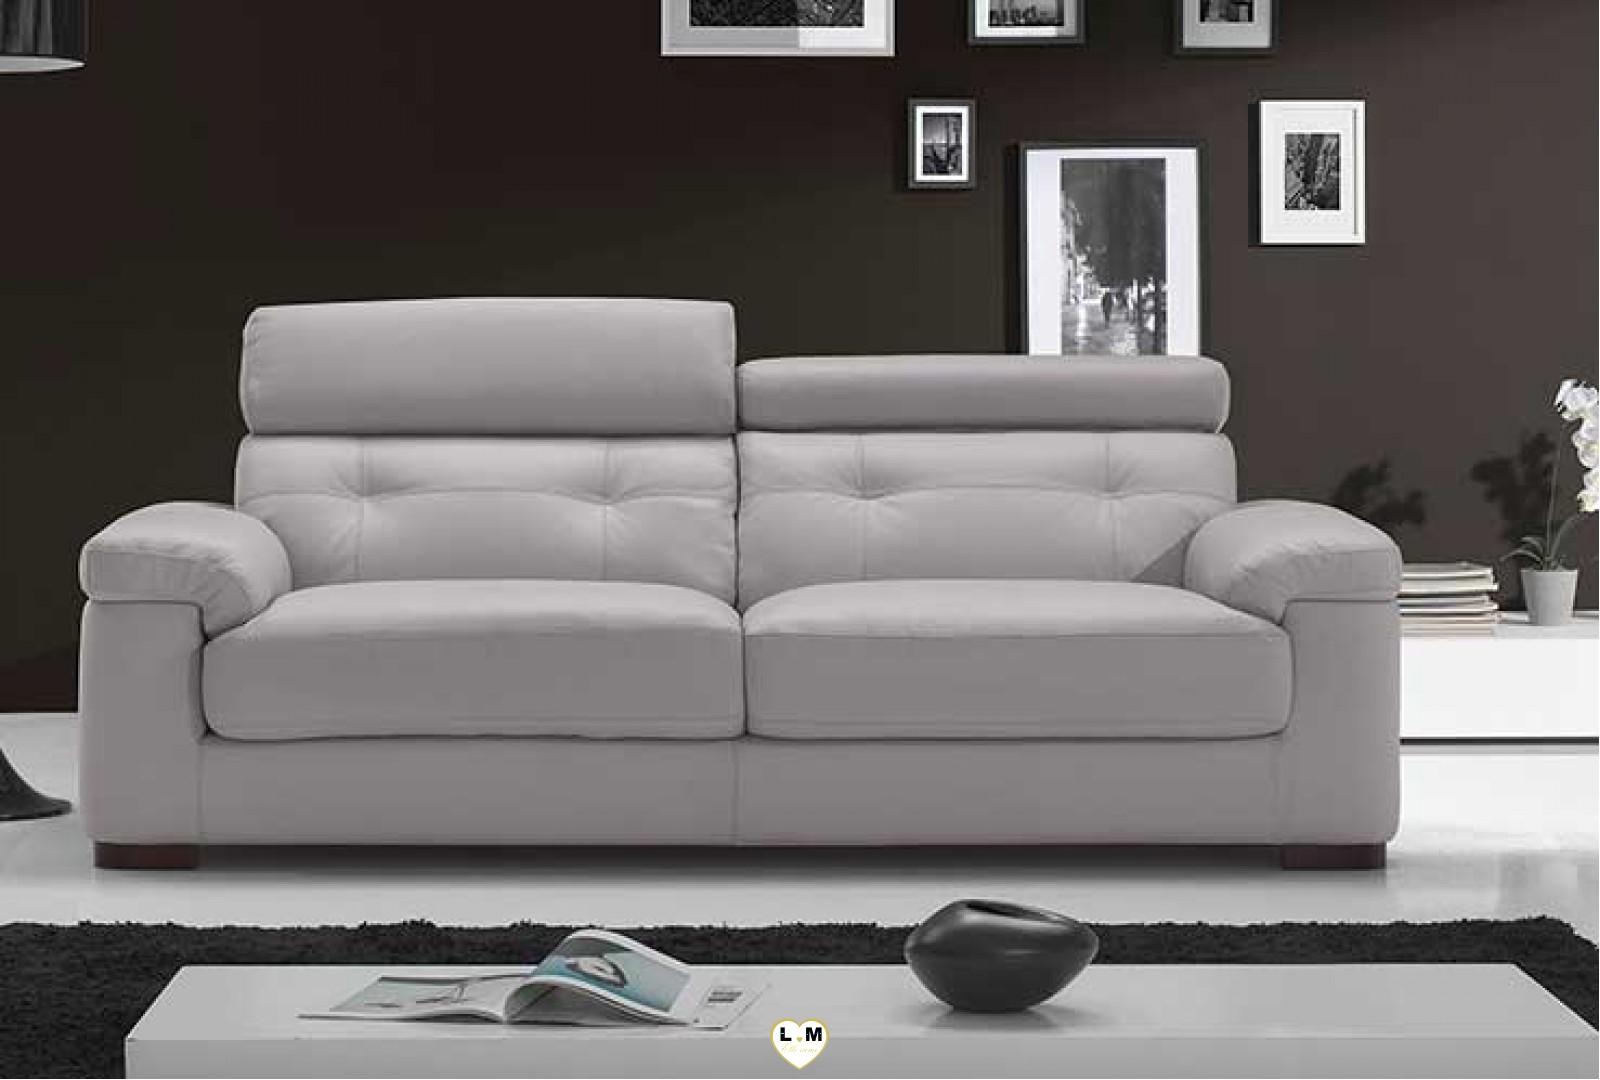 belle ensemble salon cuir lignemeuble com. Black Bedroom Furniture Sets. Home Design Ideas